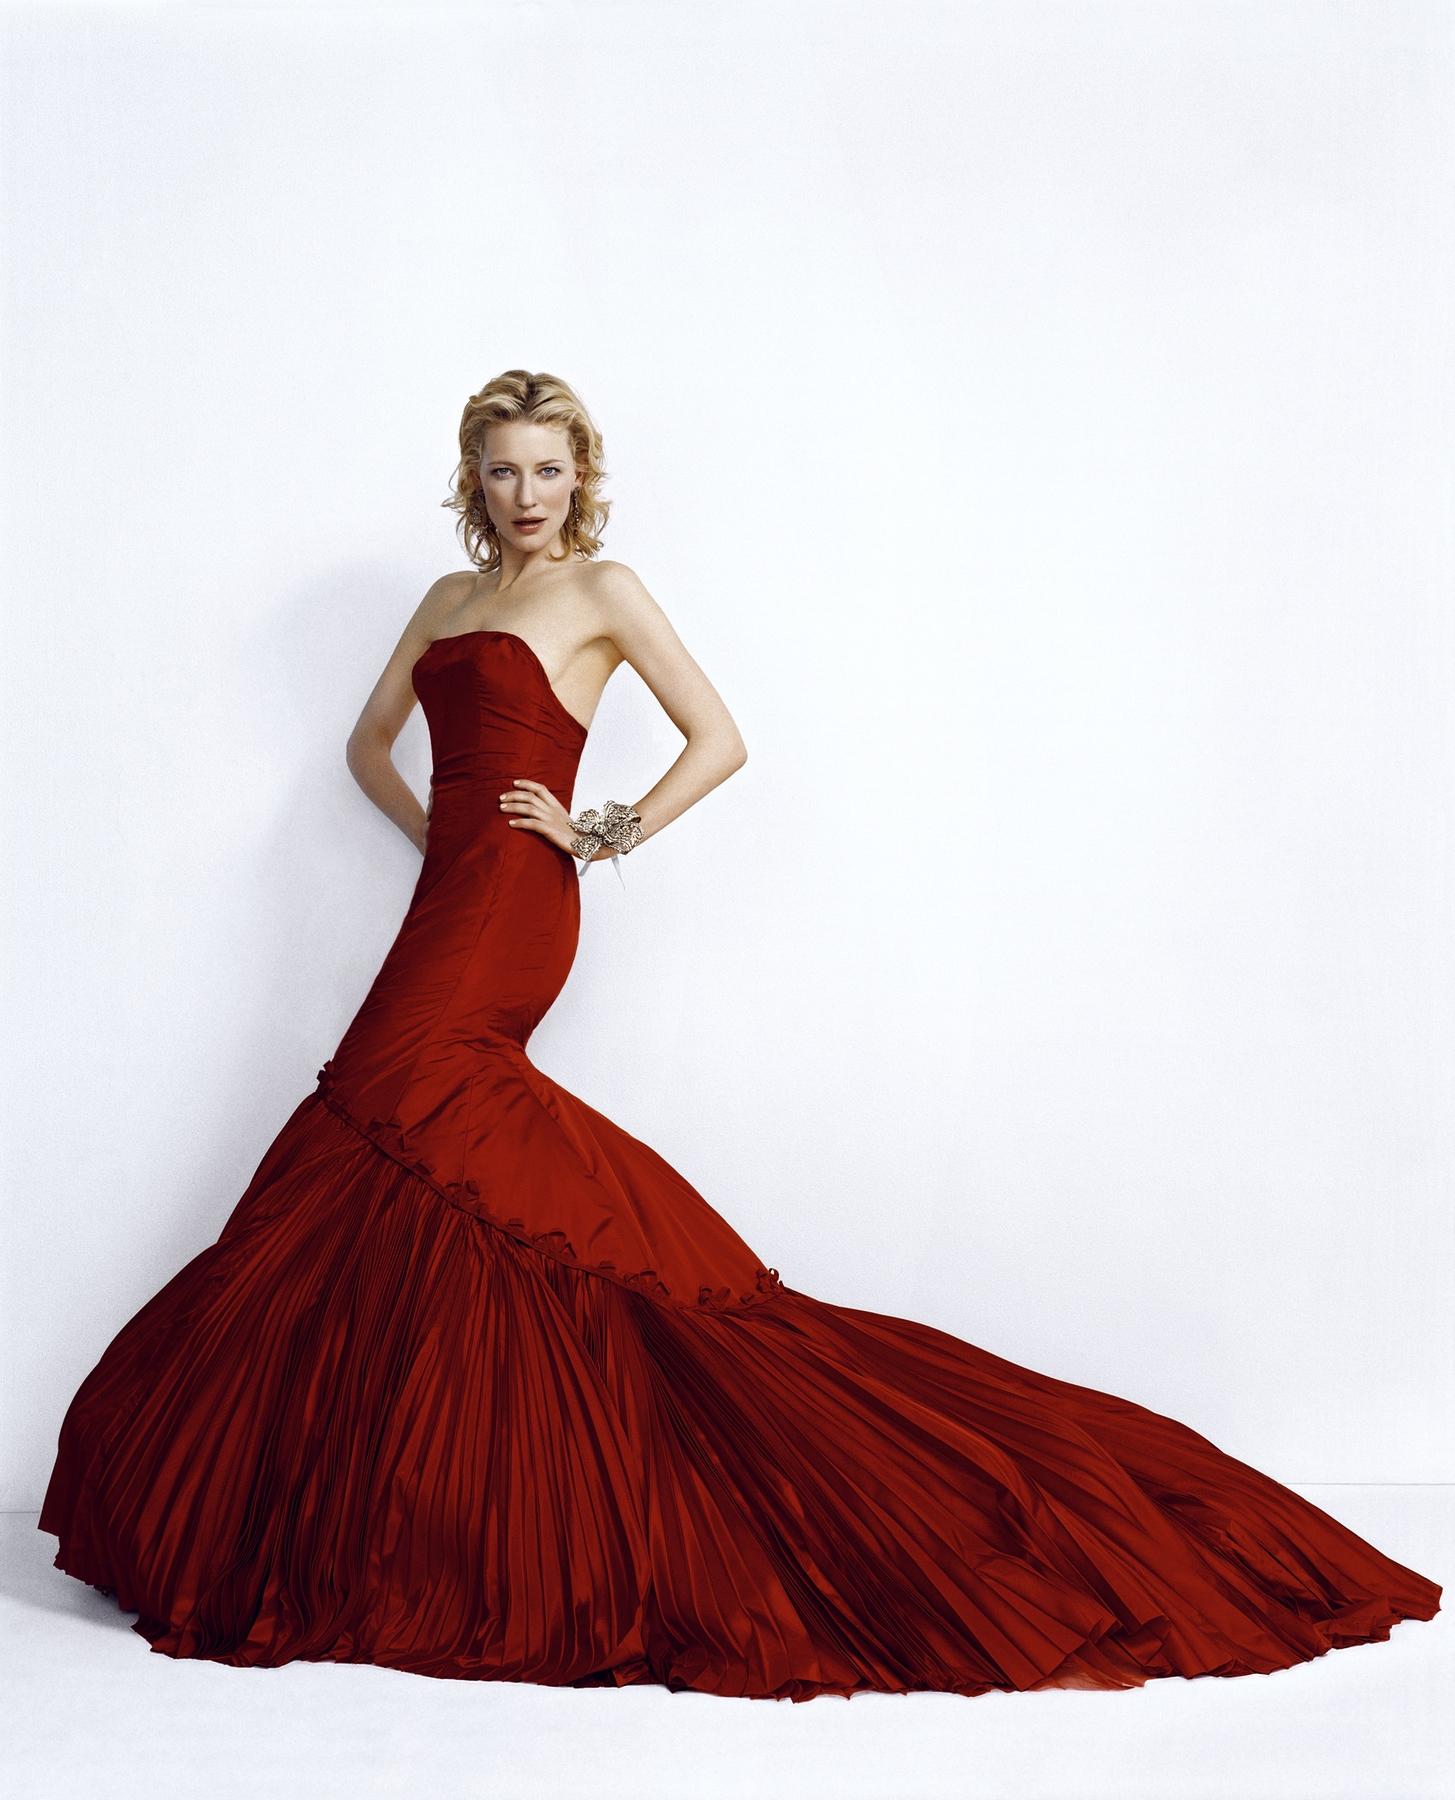 11 Upoznajte: Cate Blanchett